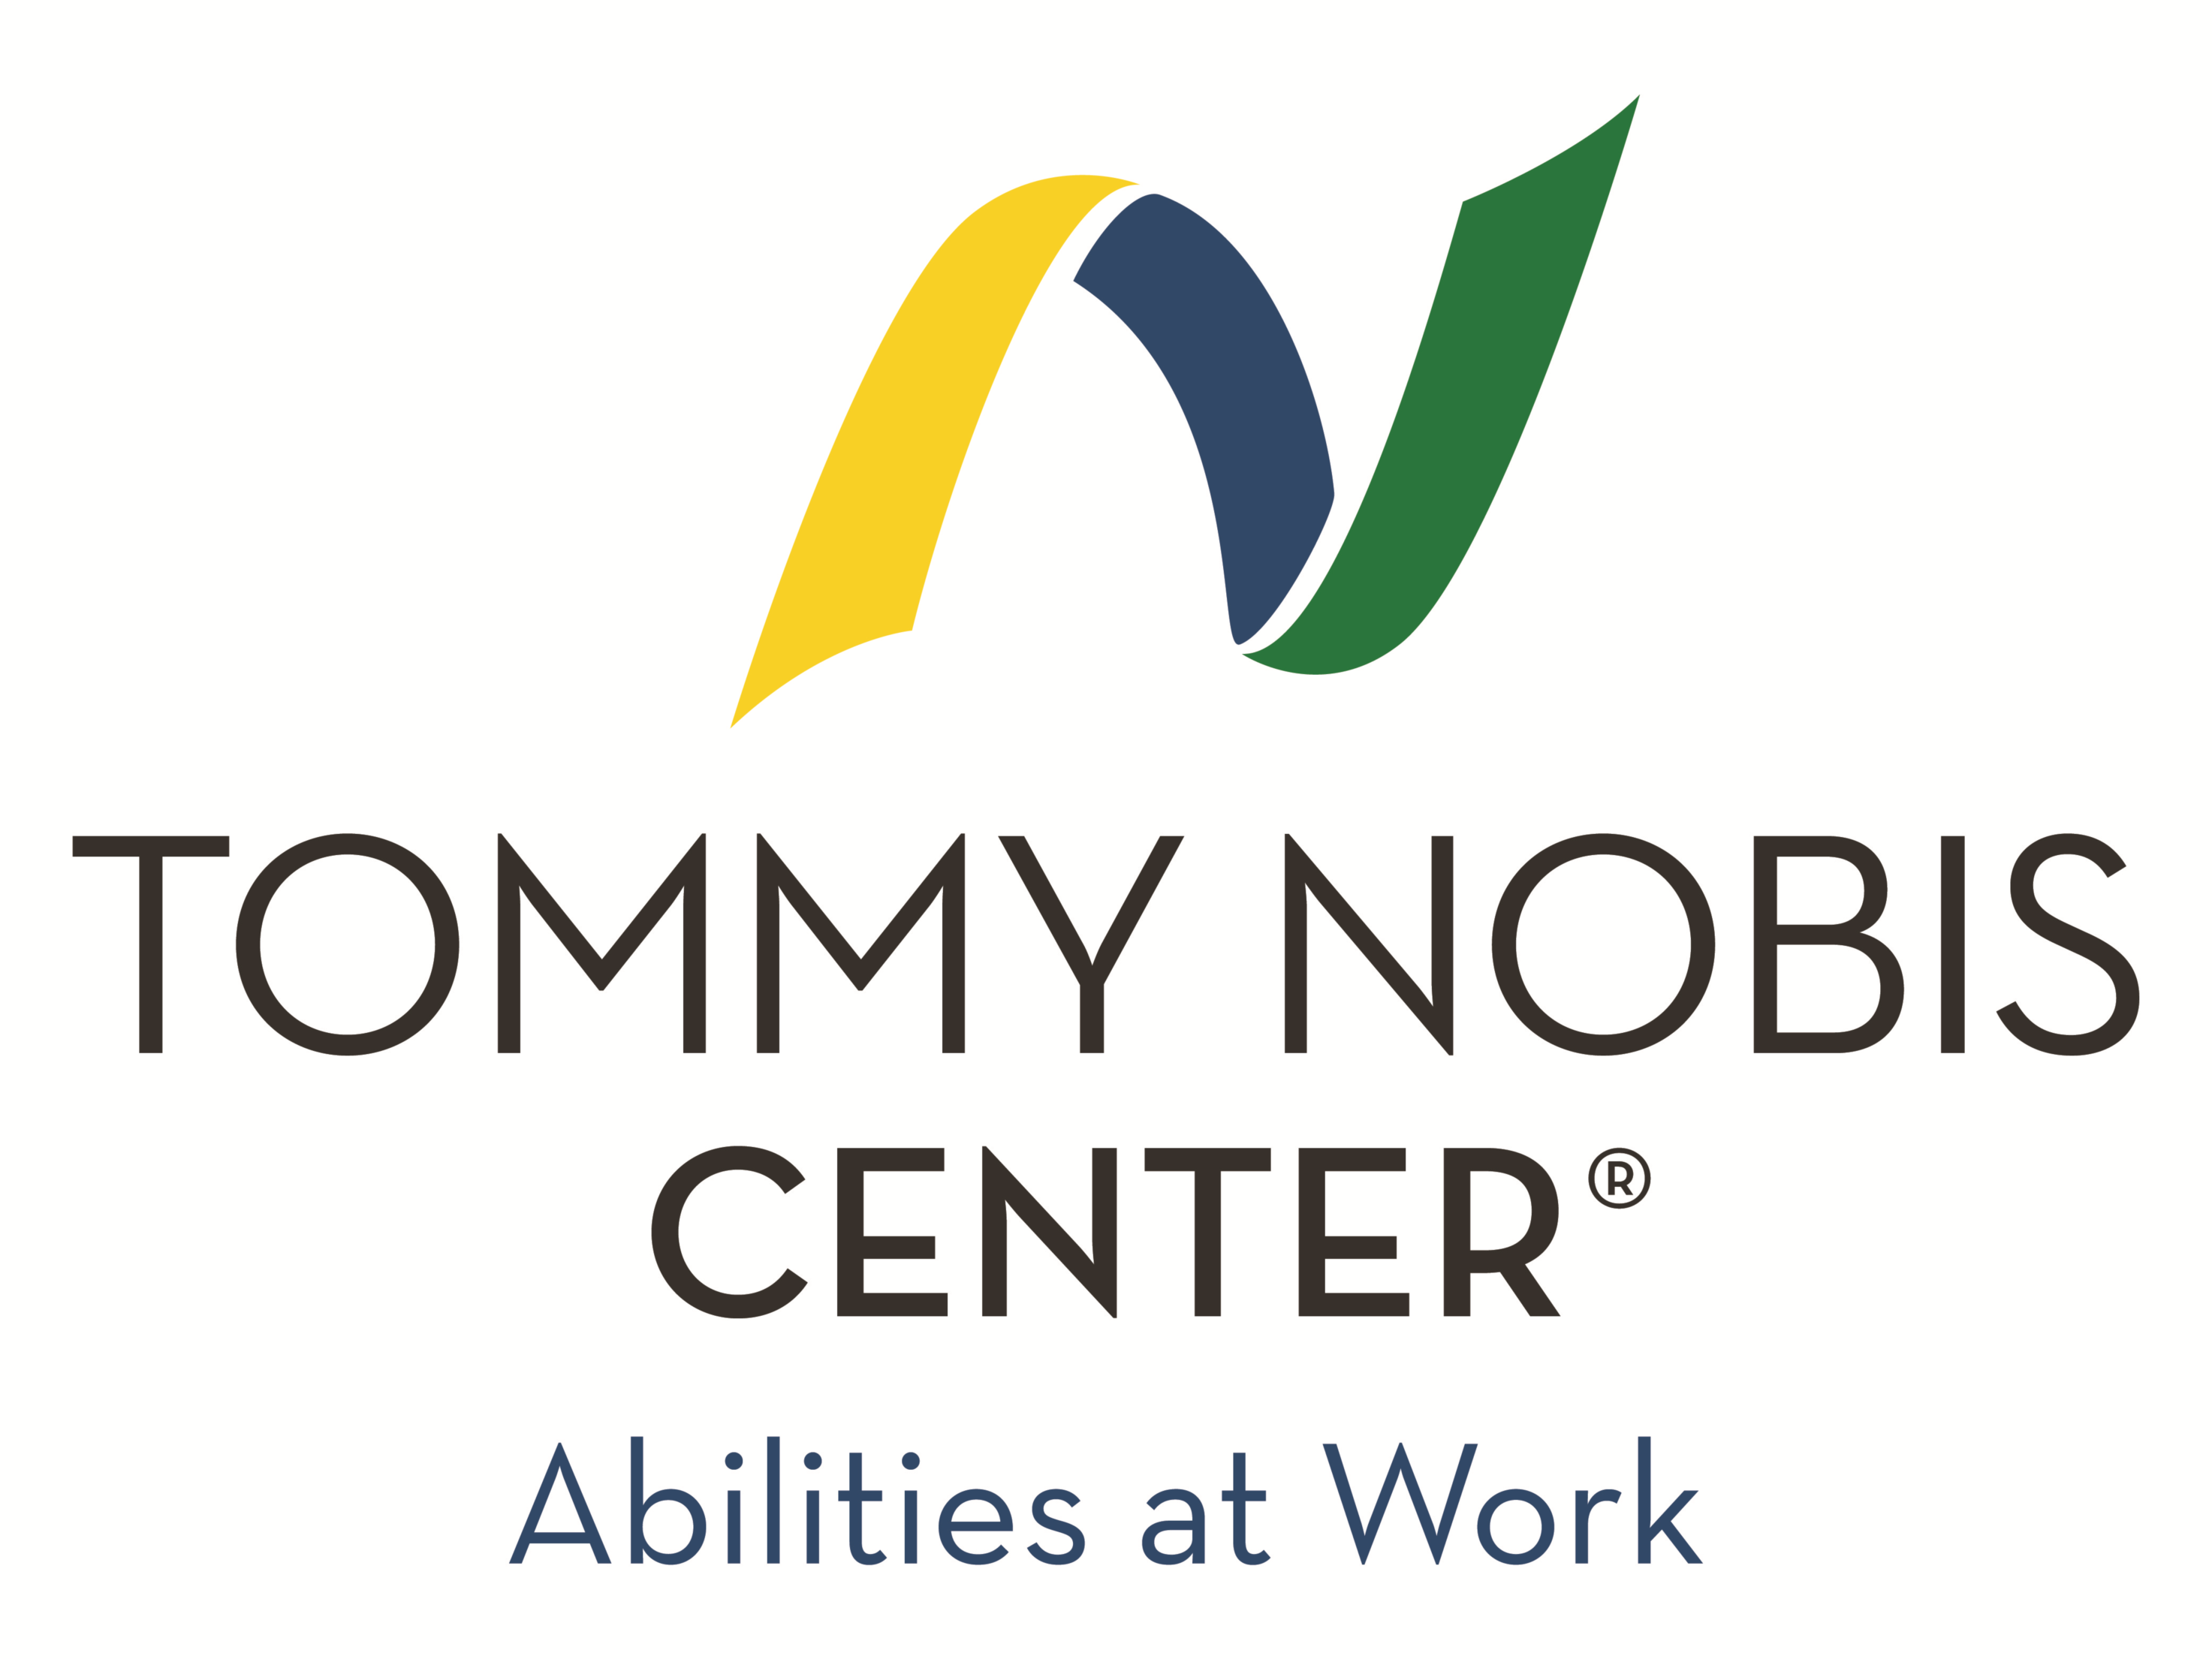 Tommy Nobis Center Company Logo